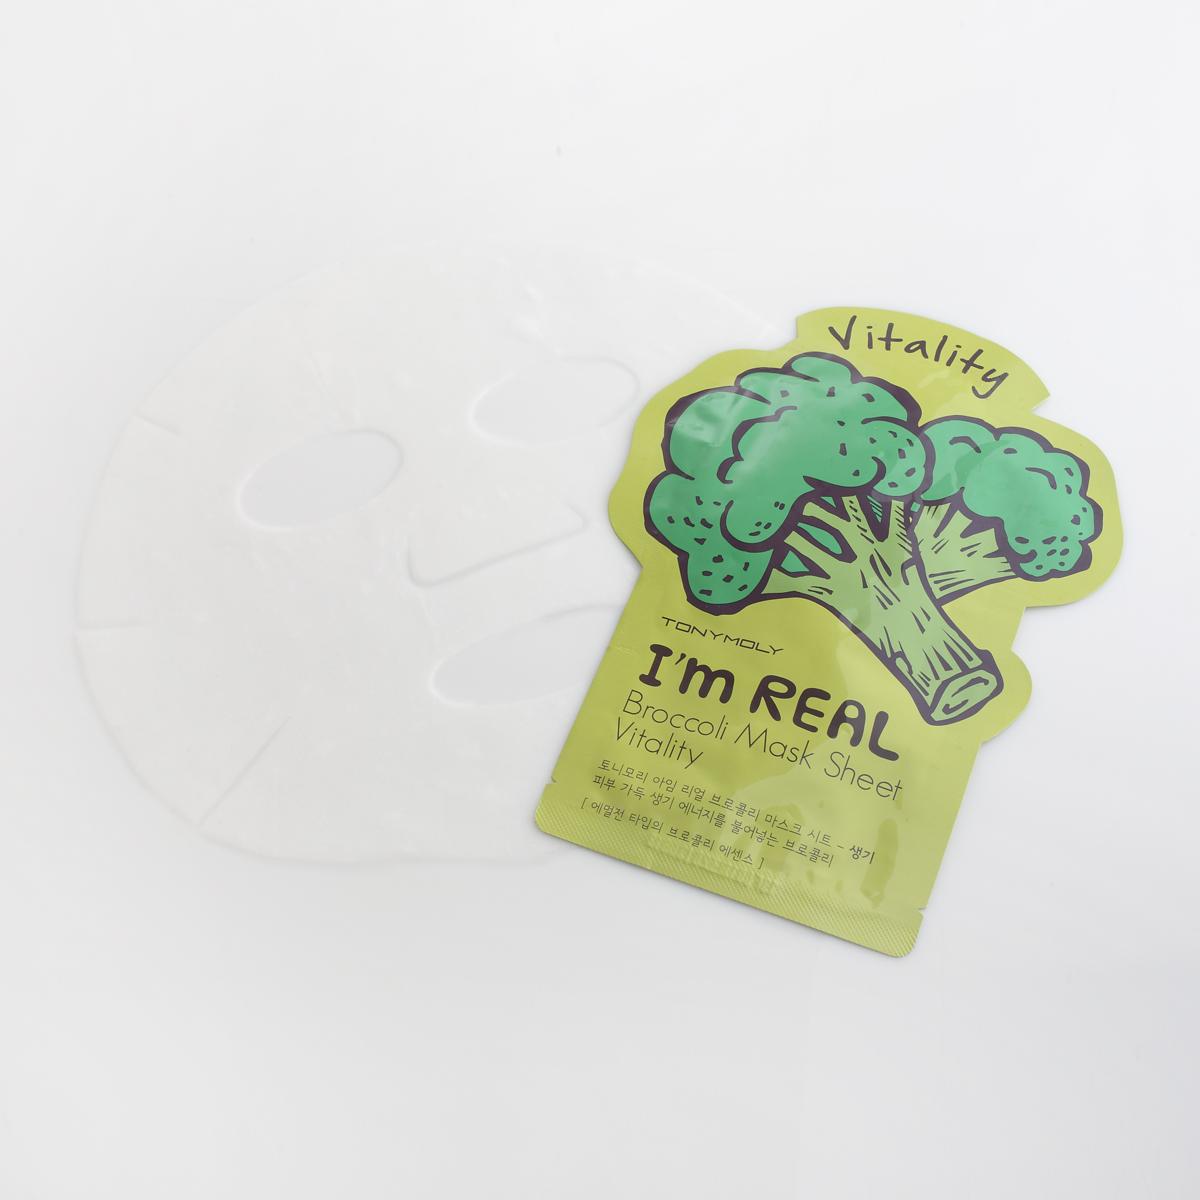 TonyMolyТканевая маска с экстрактом брокколи Im Real Broccoli Mask Sheet, 21 мл (Tonymoly)